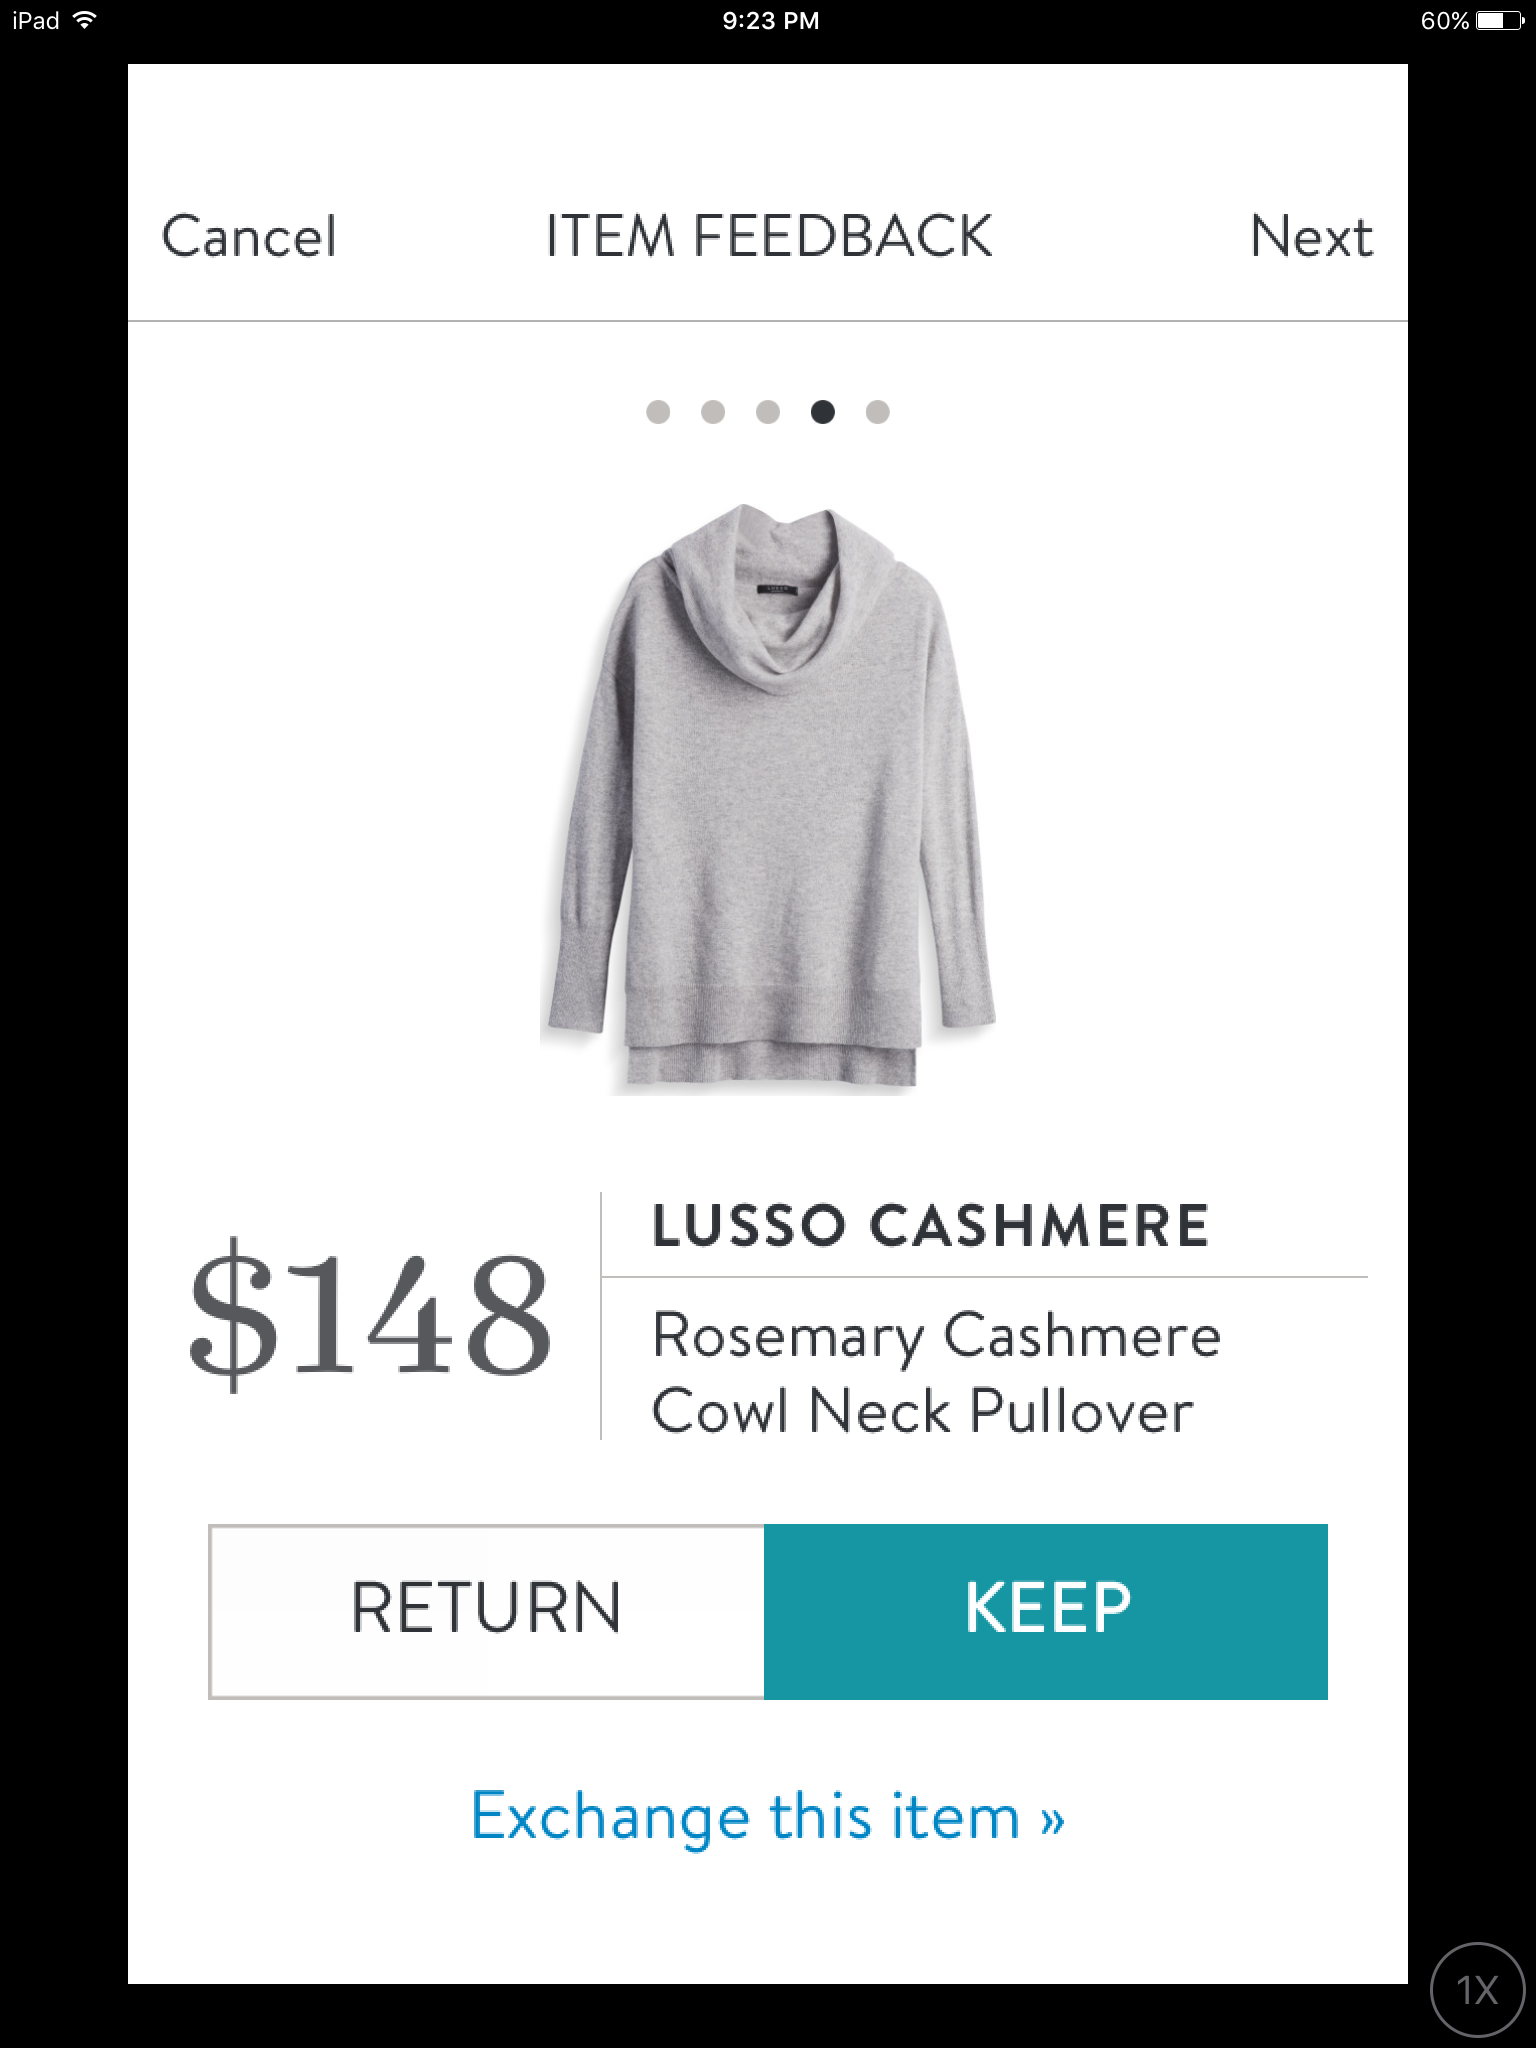 Lusso Cashmere Rosemary Cashmere Cowl Neck Pullover Stitch